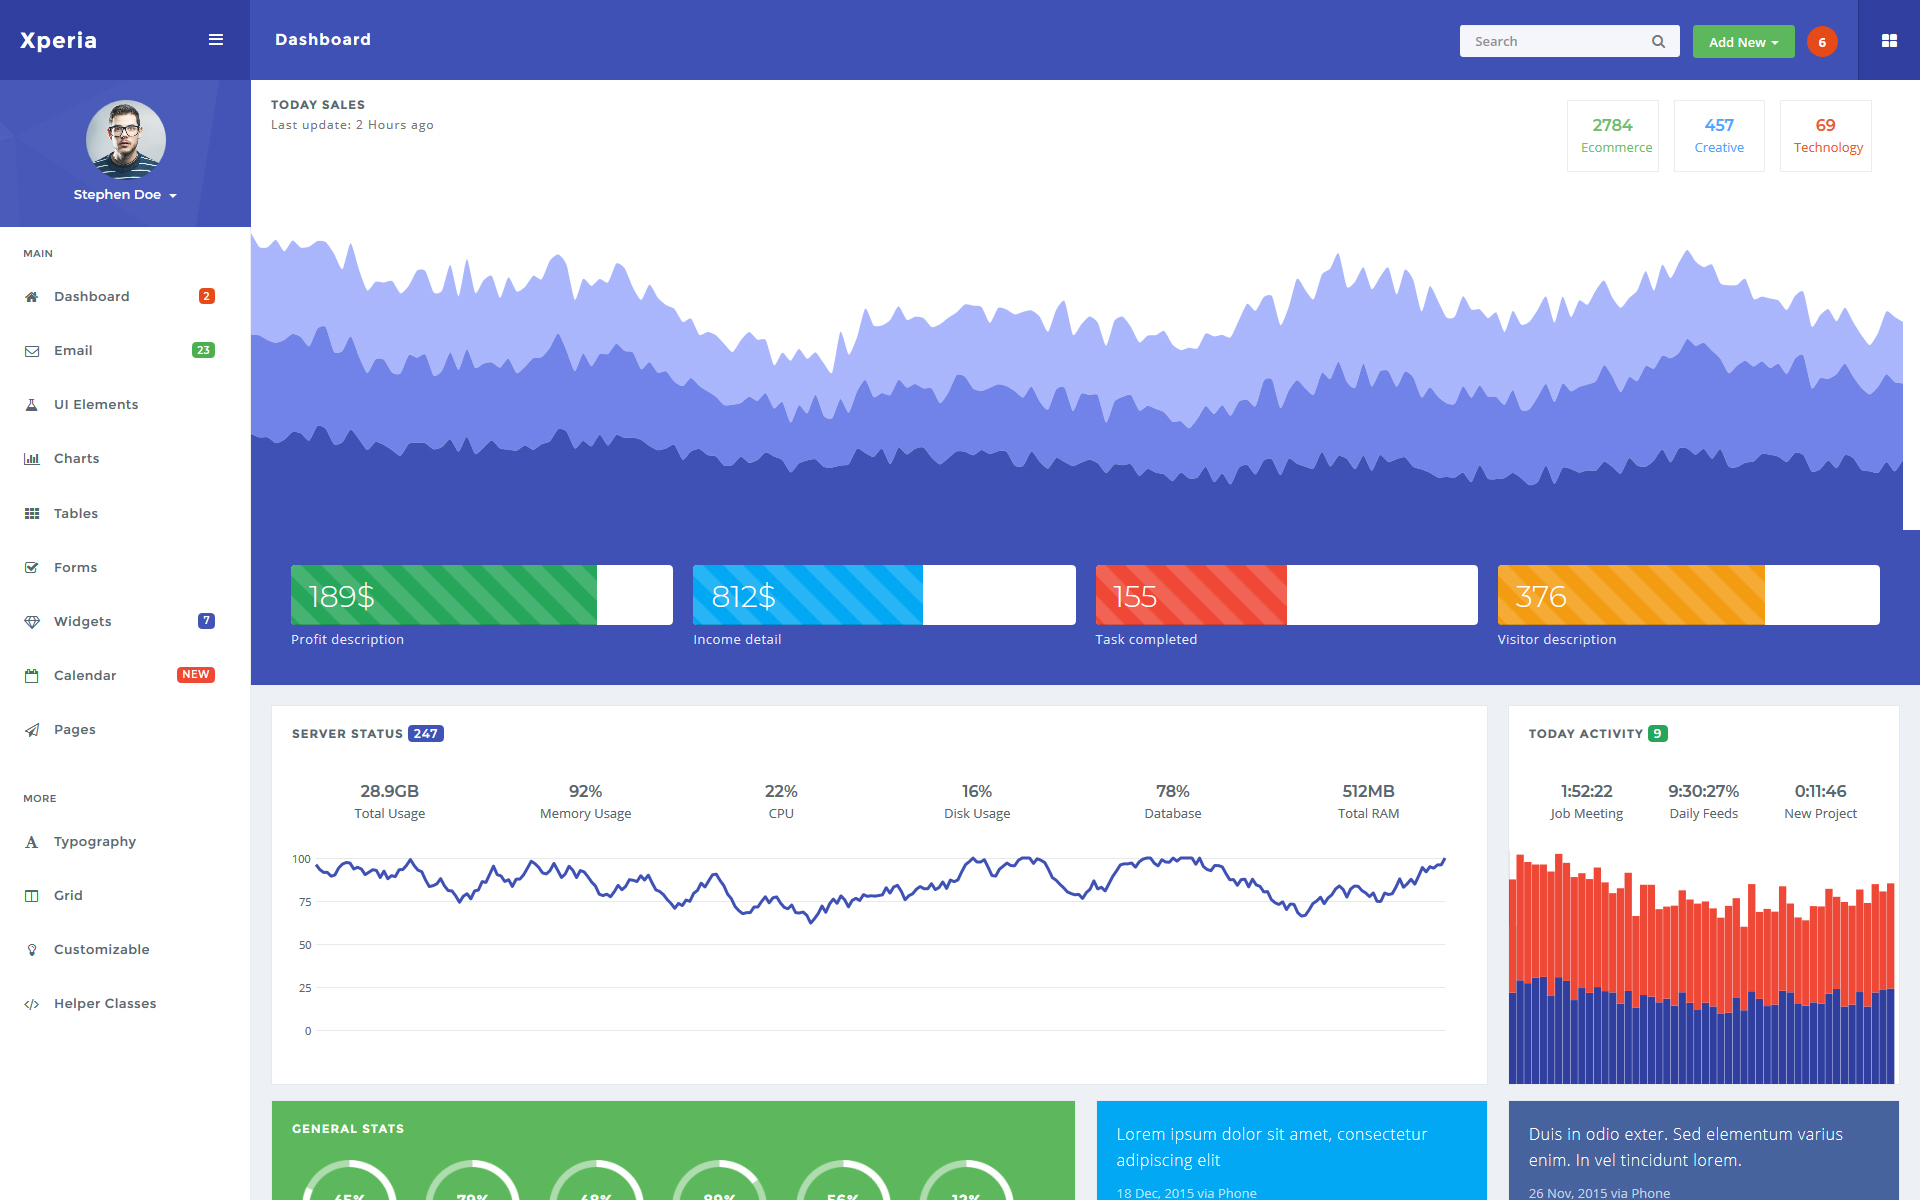 Xperia - Bootstrap Dashboard Admin Template